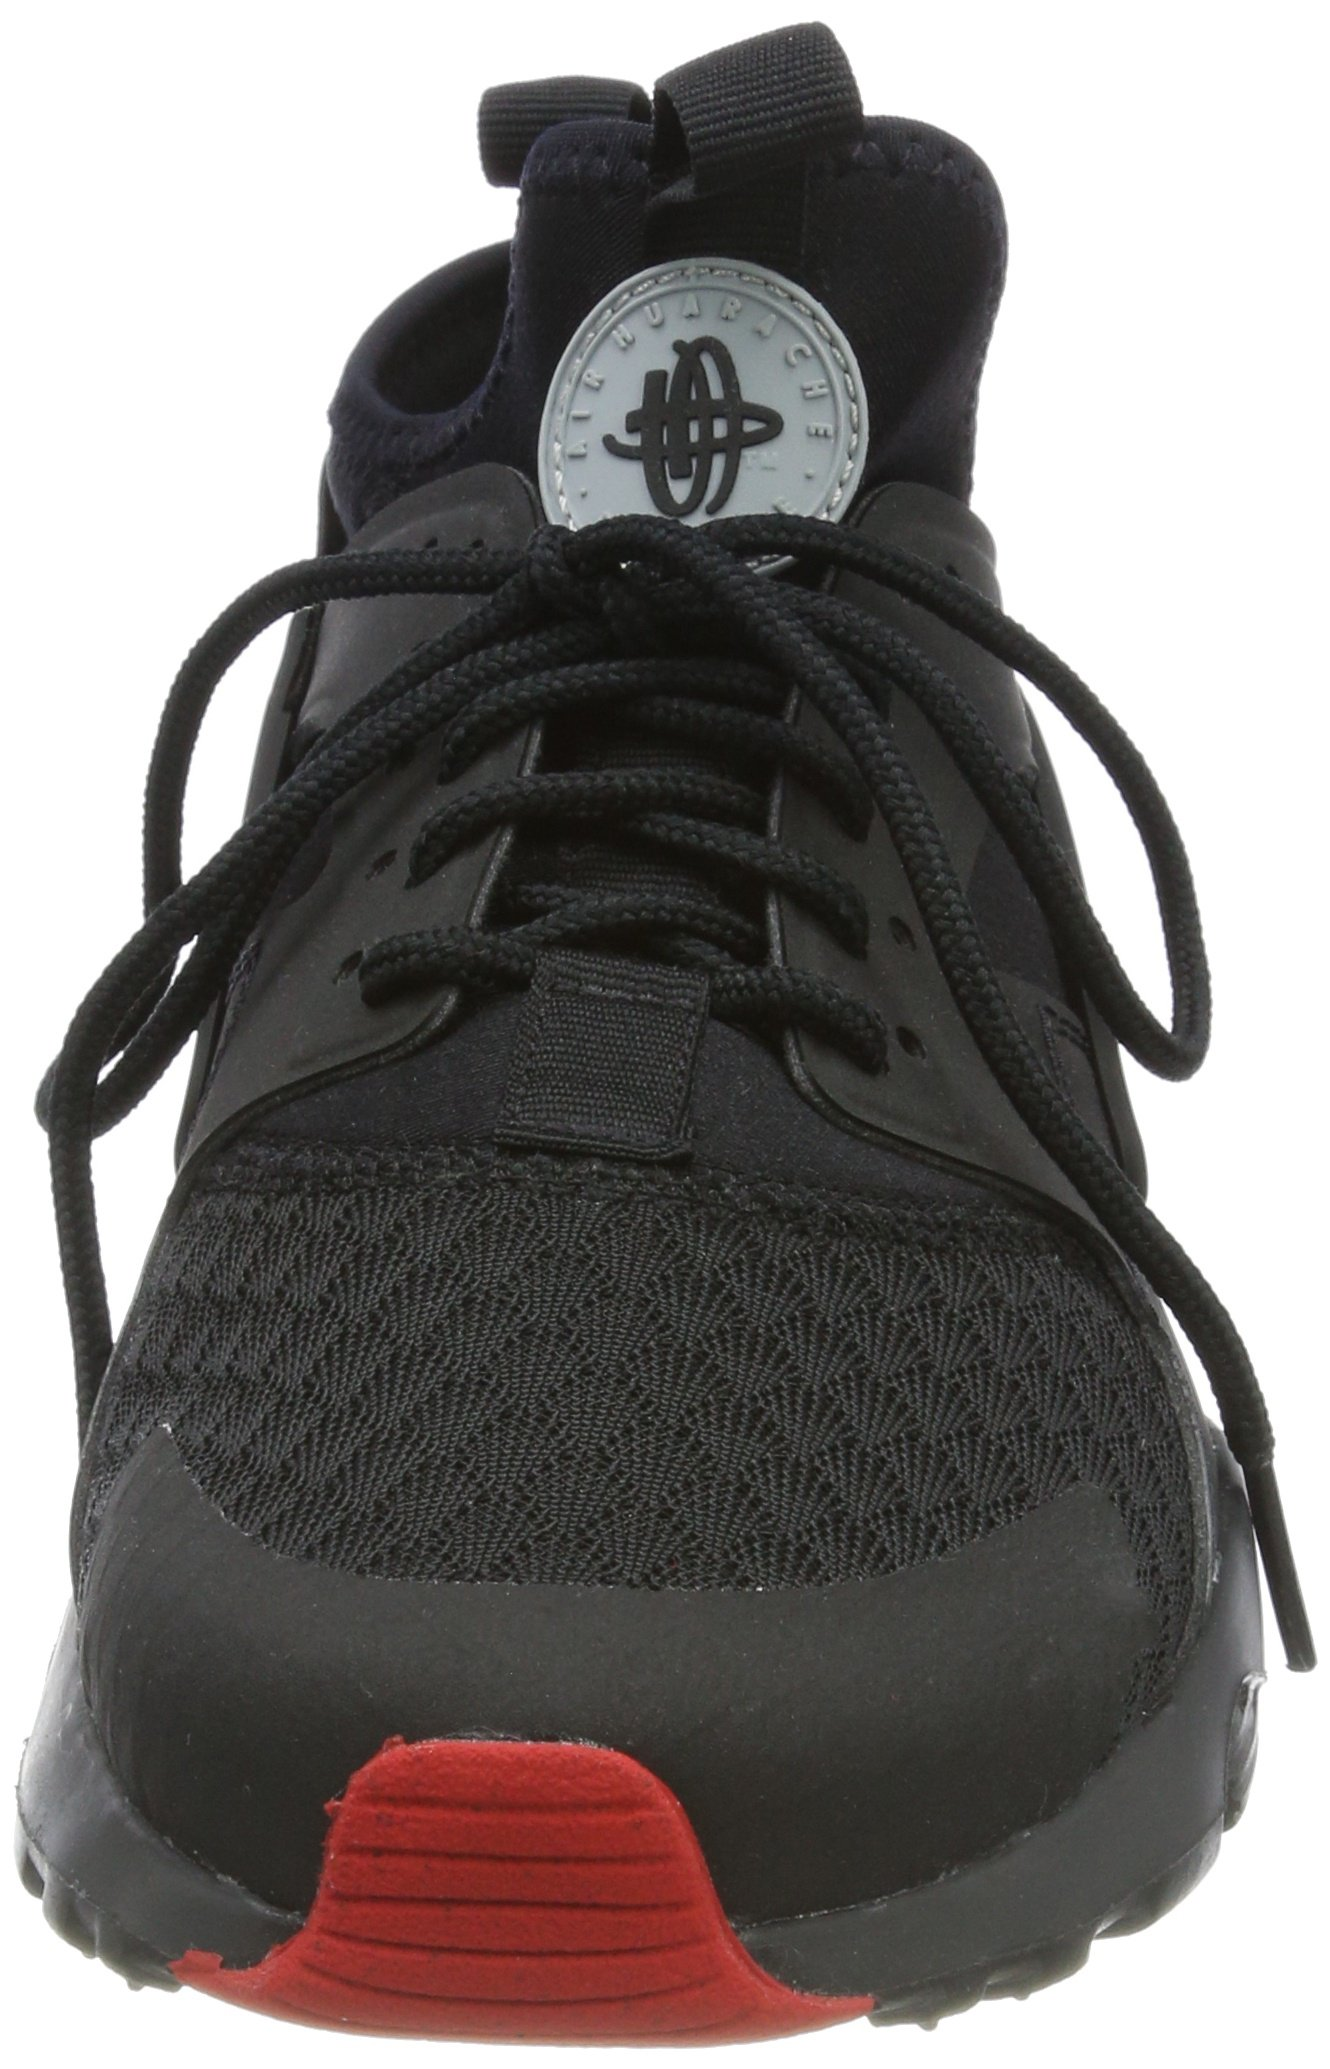 Nike Air Huarache Run Ultra Black/Metallic Silver (11 D(M) US) by NIKE (Image #4)